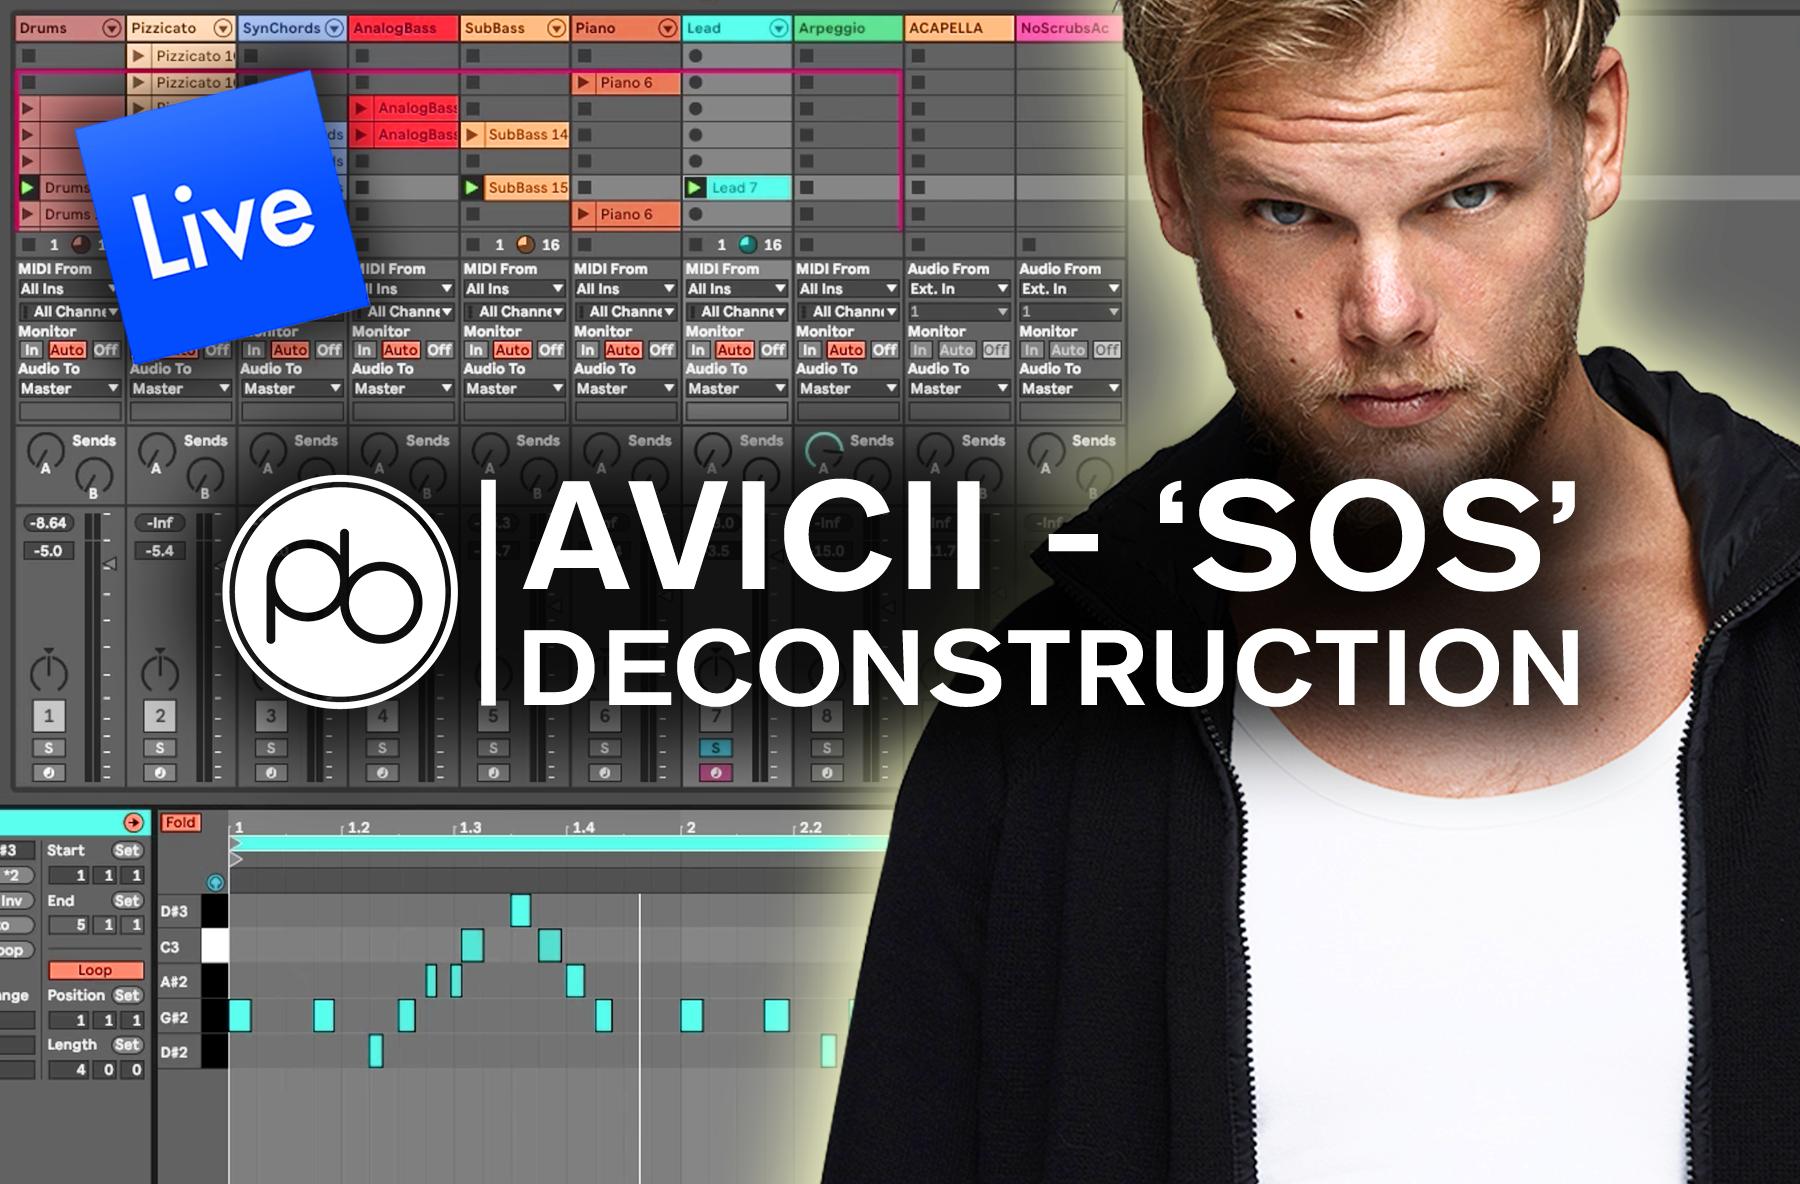 Watch Ski Oakenfull Deconstruct Avicii's 'SOS' ft. Aloe Blacc